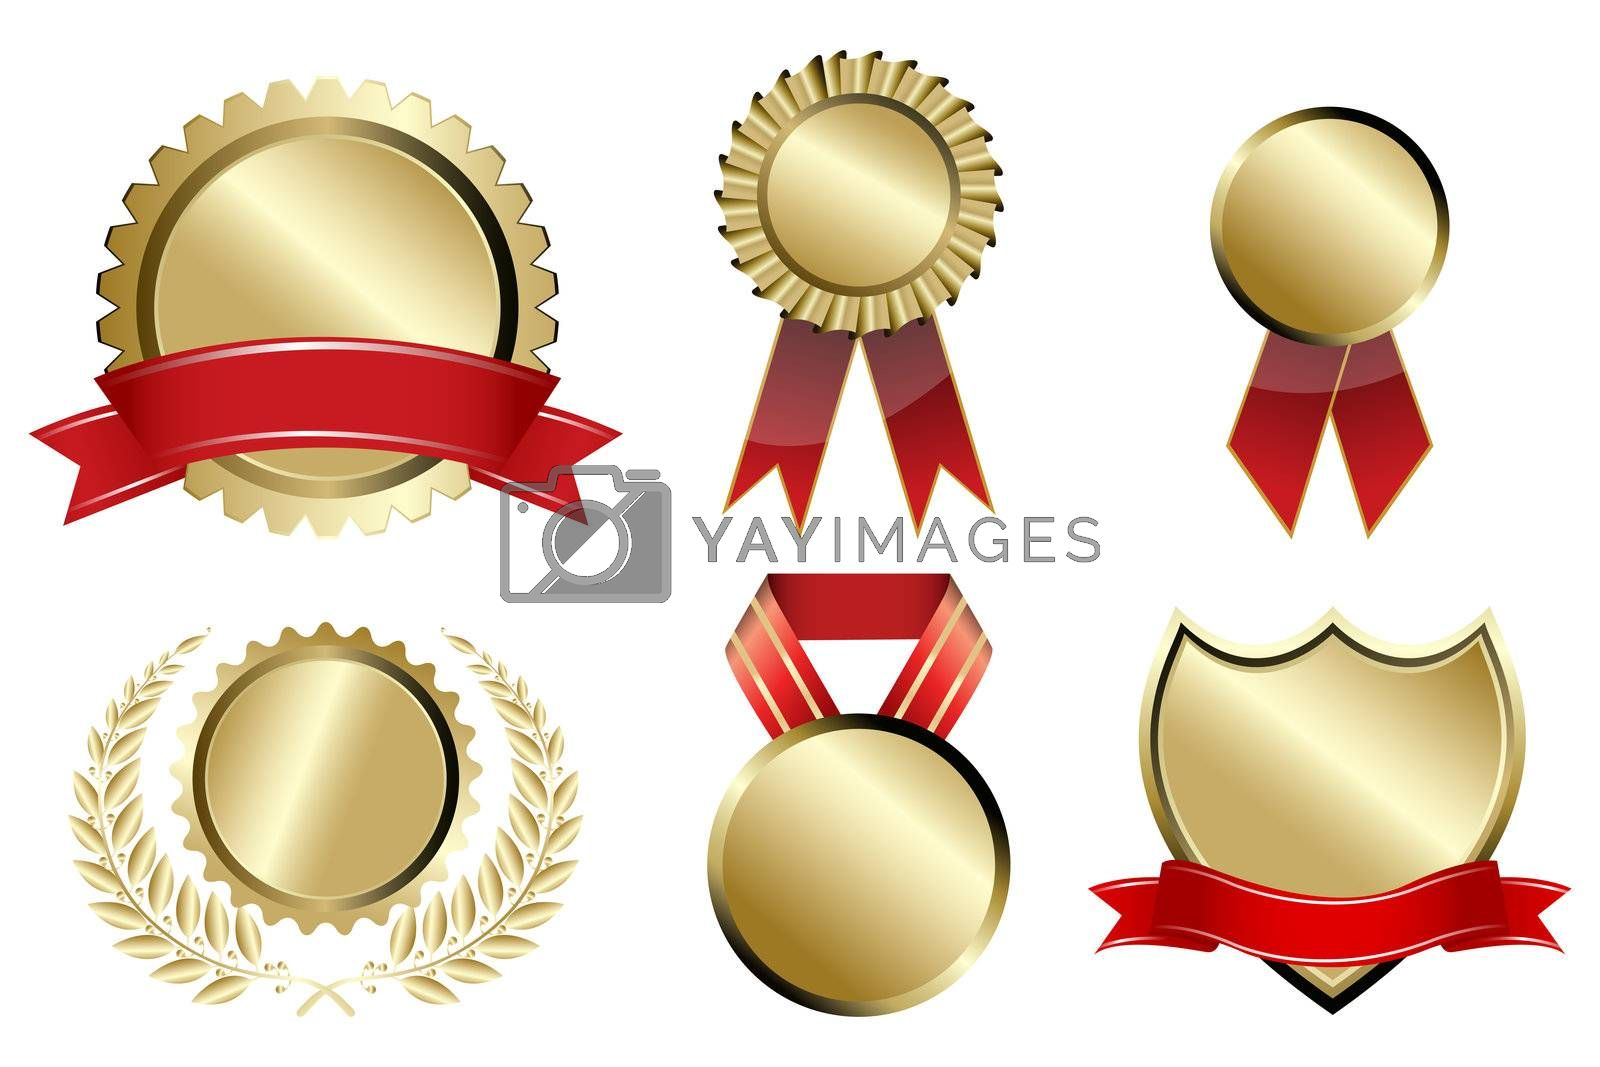 illustration of types of prizes on white background